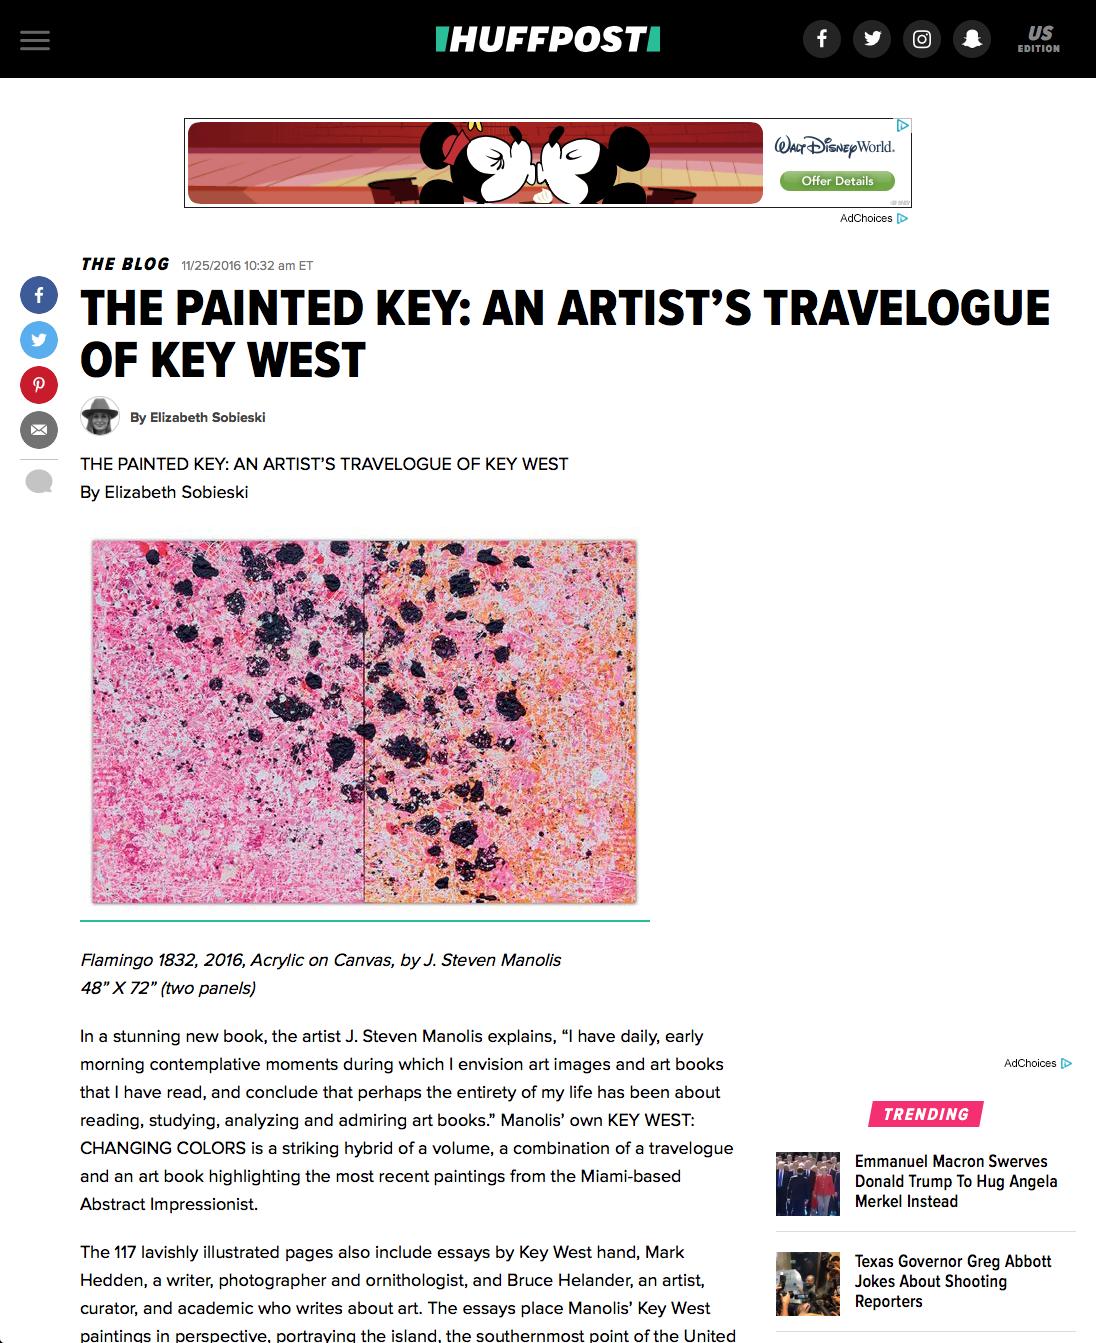 ElizabethSobieski-JStevenManolis-HuffingtonPost-PaintedKey-11-2016.png